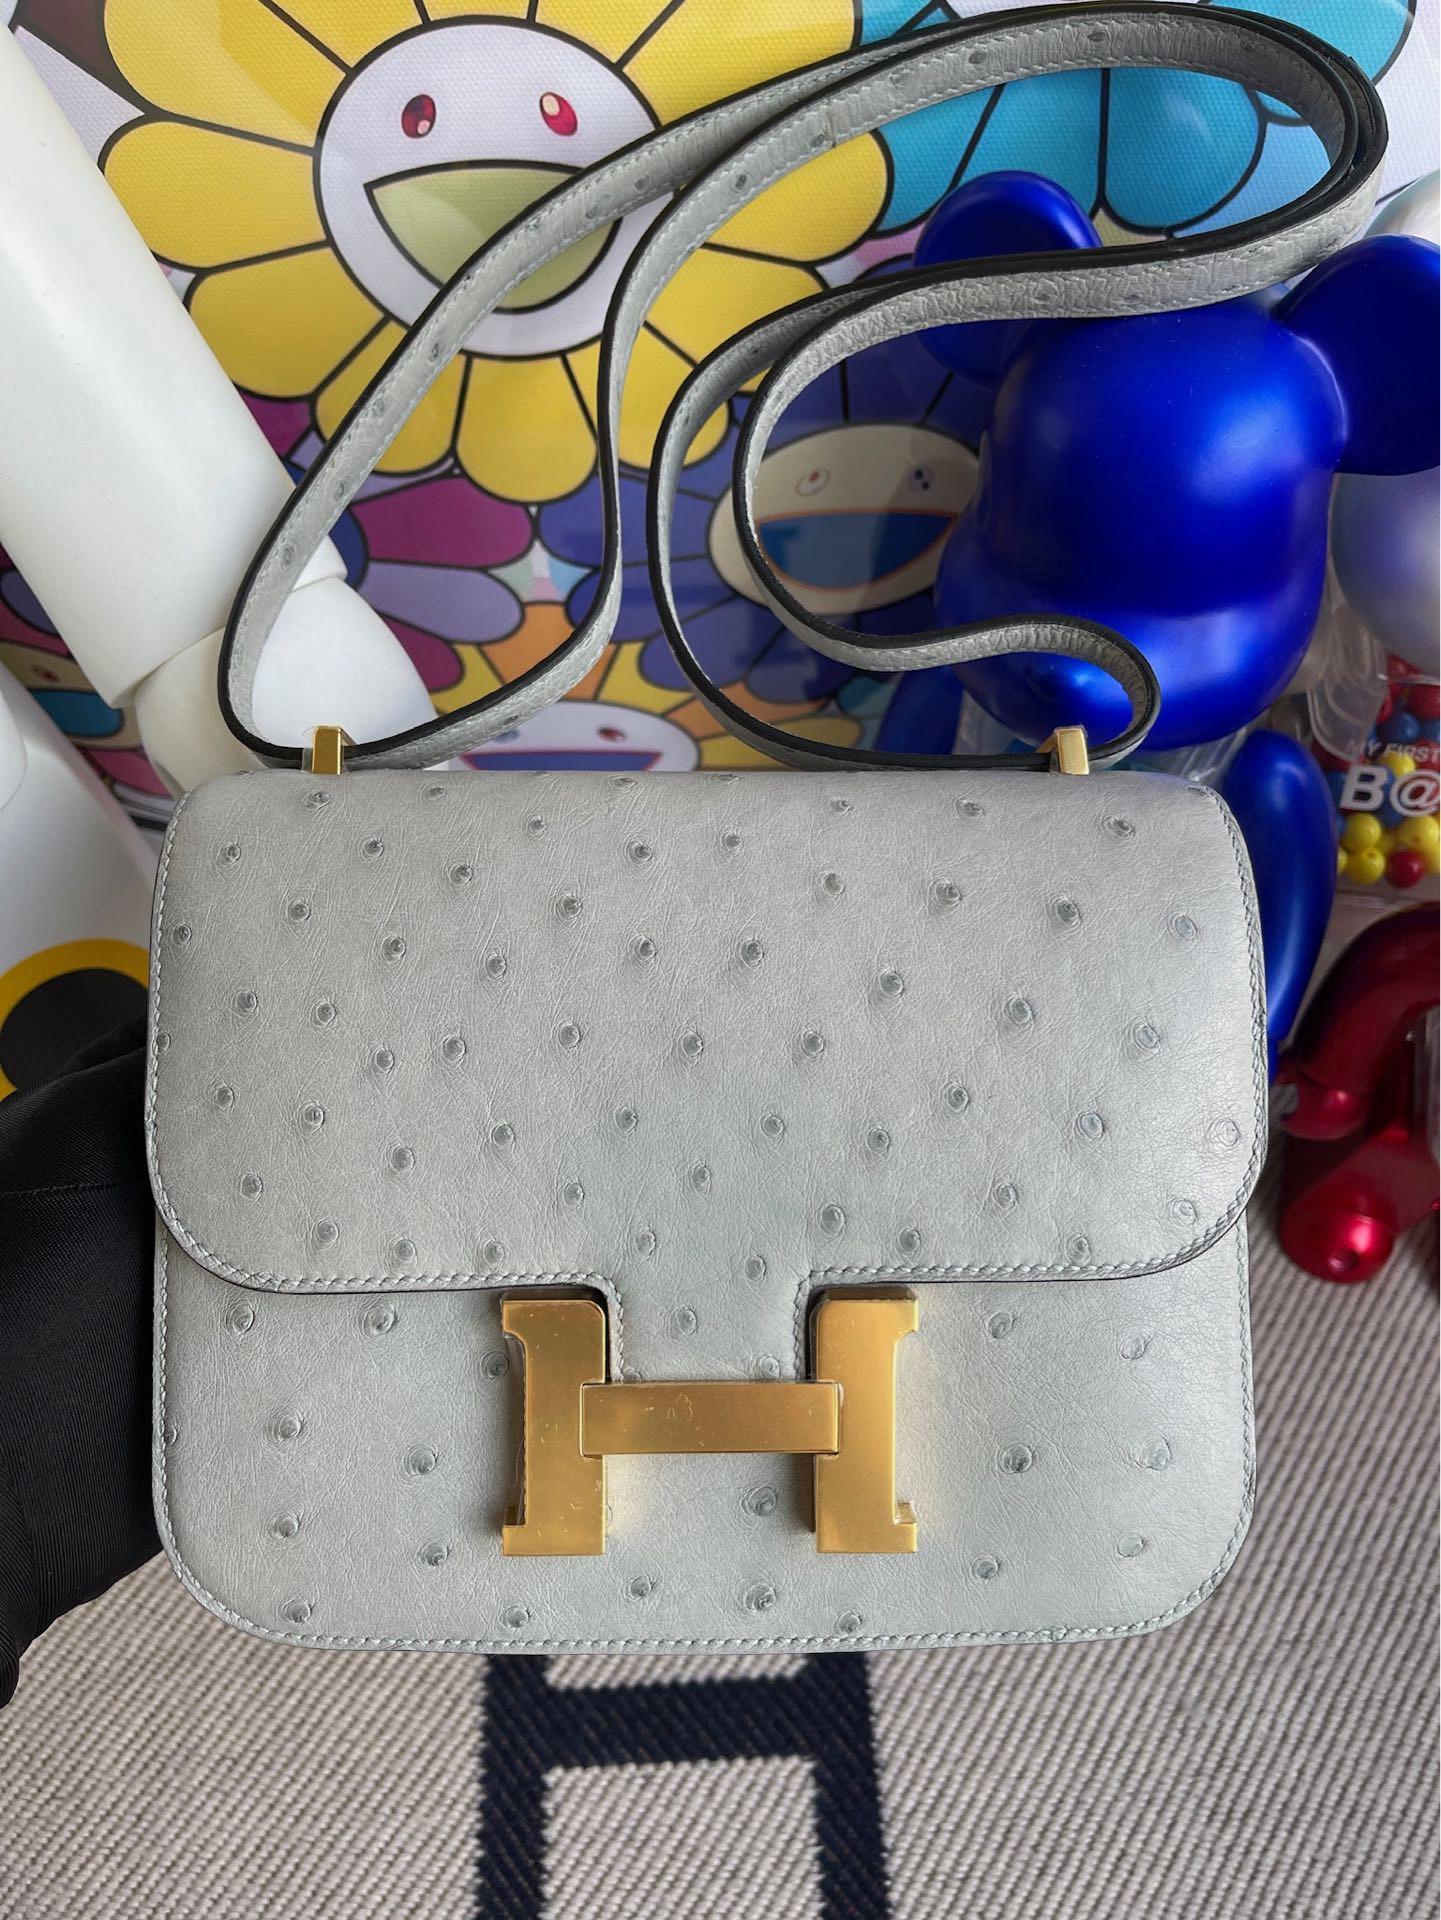 Hermès(爱马仕)Constance 空姐包 Ostrich kk鸵鸟 8U 冰川蓝 Blue glacier 金扣 18cm 顶级手缝